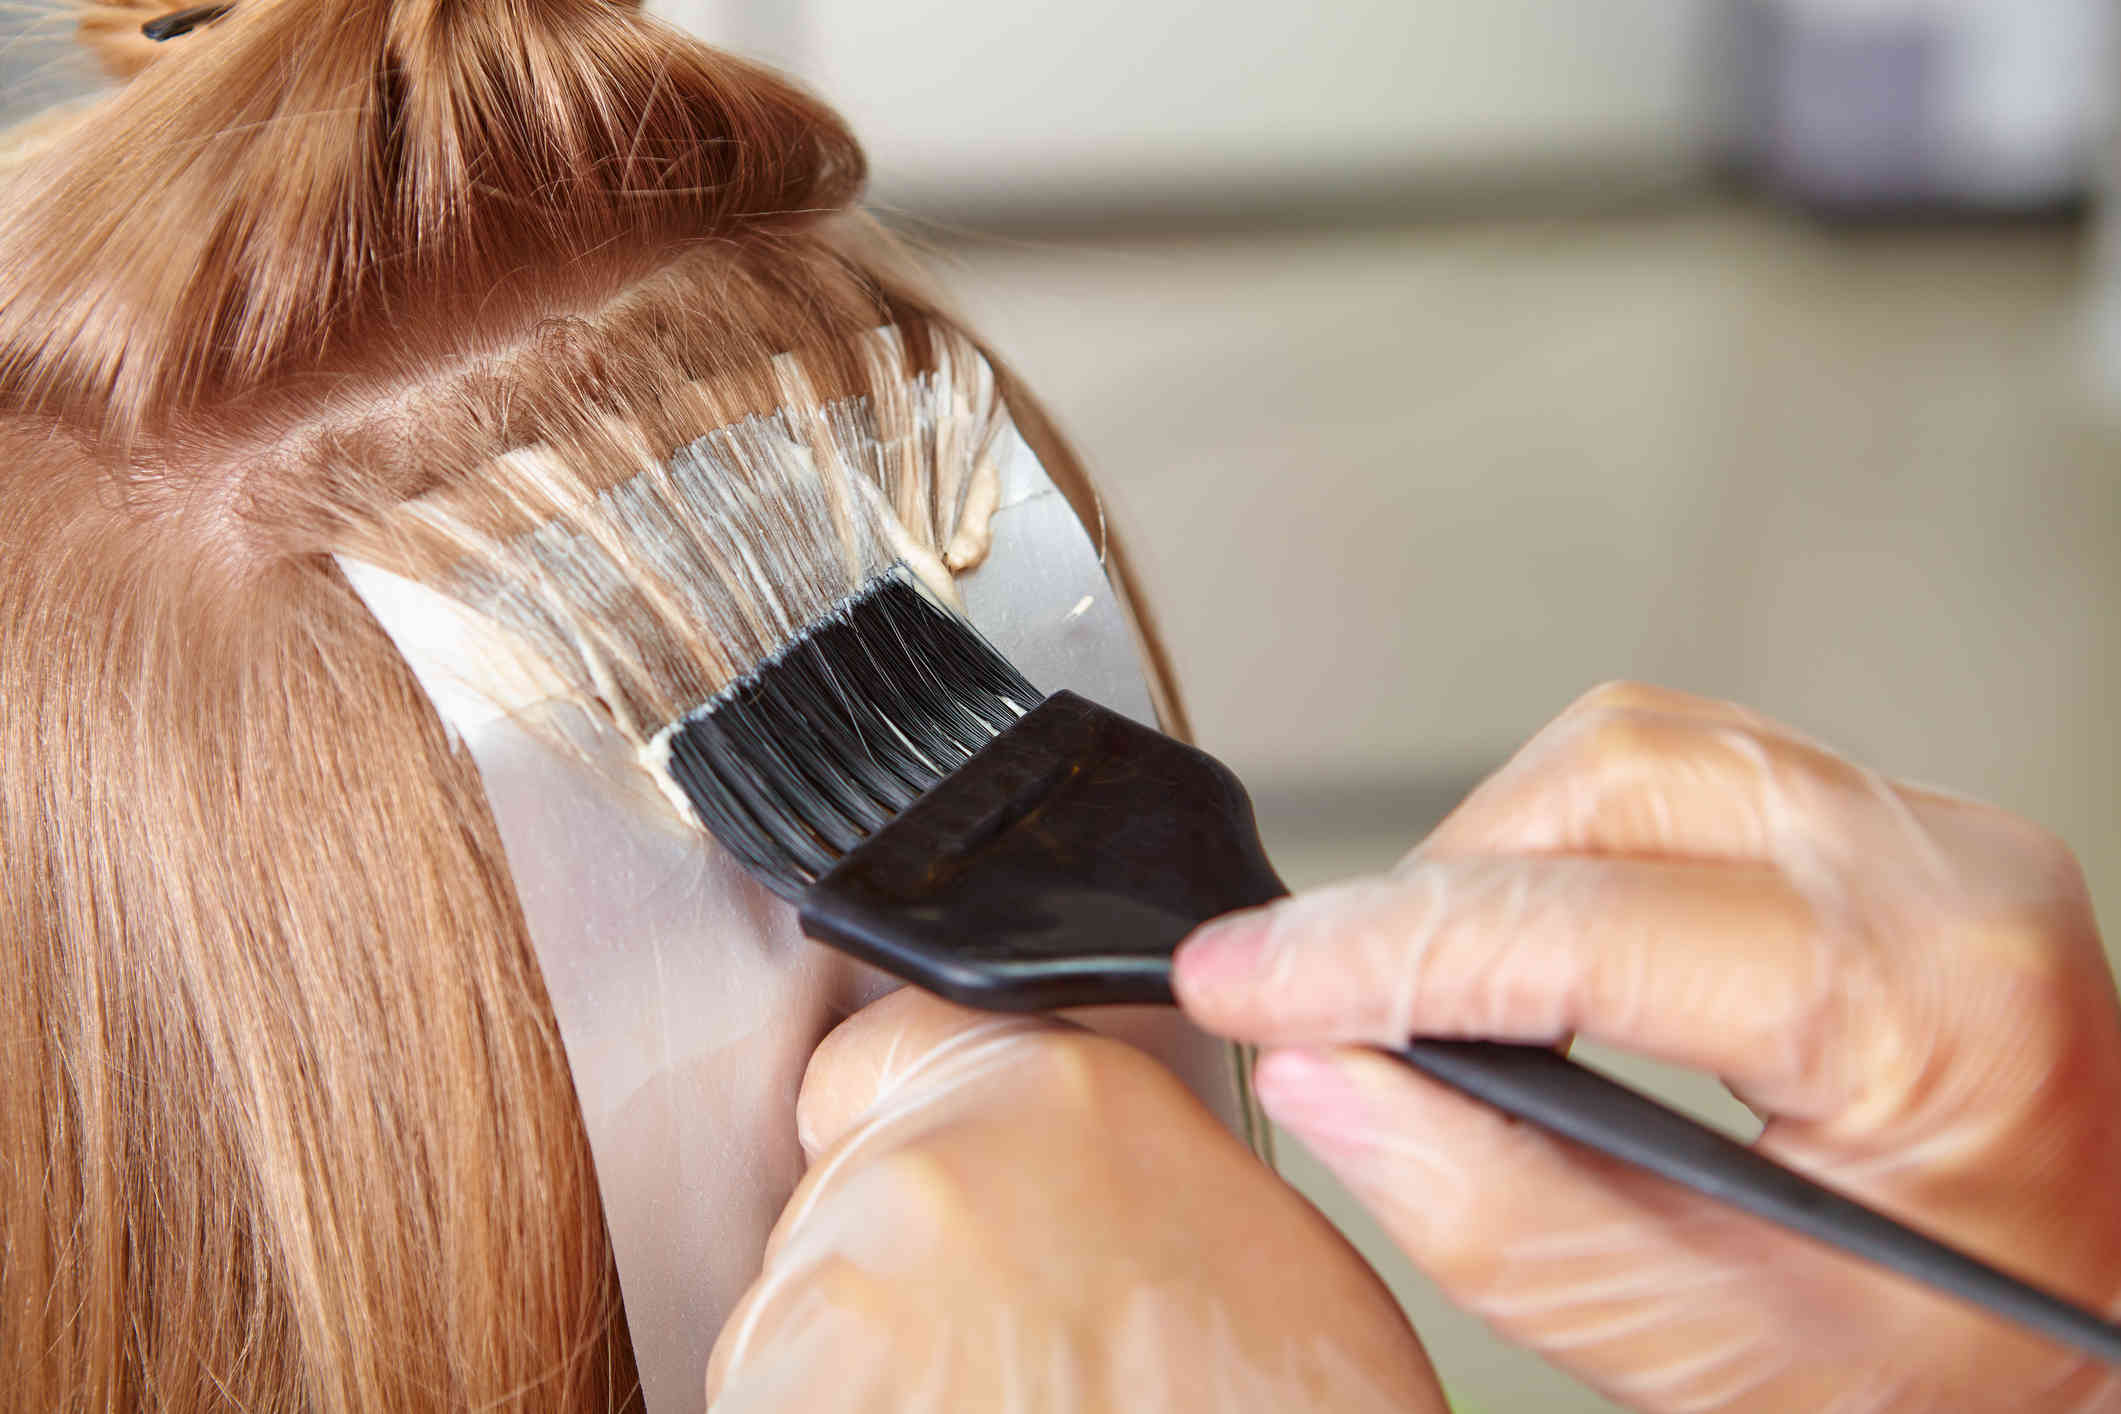 Hair Care Industry Growth Top Hair Dye Brands Hair Care Industry Global Hair Color Market Technavio Blog